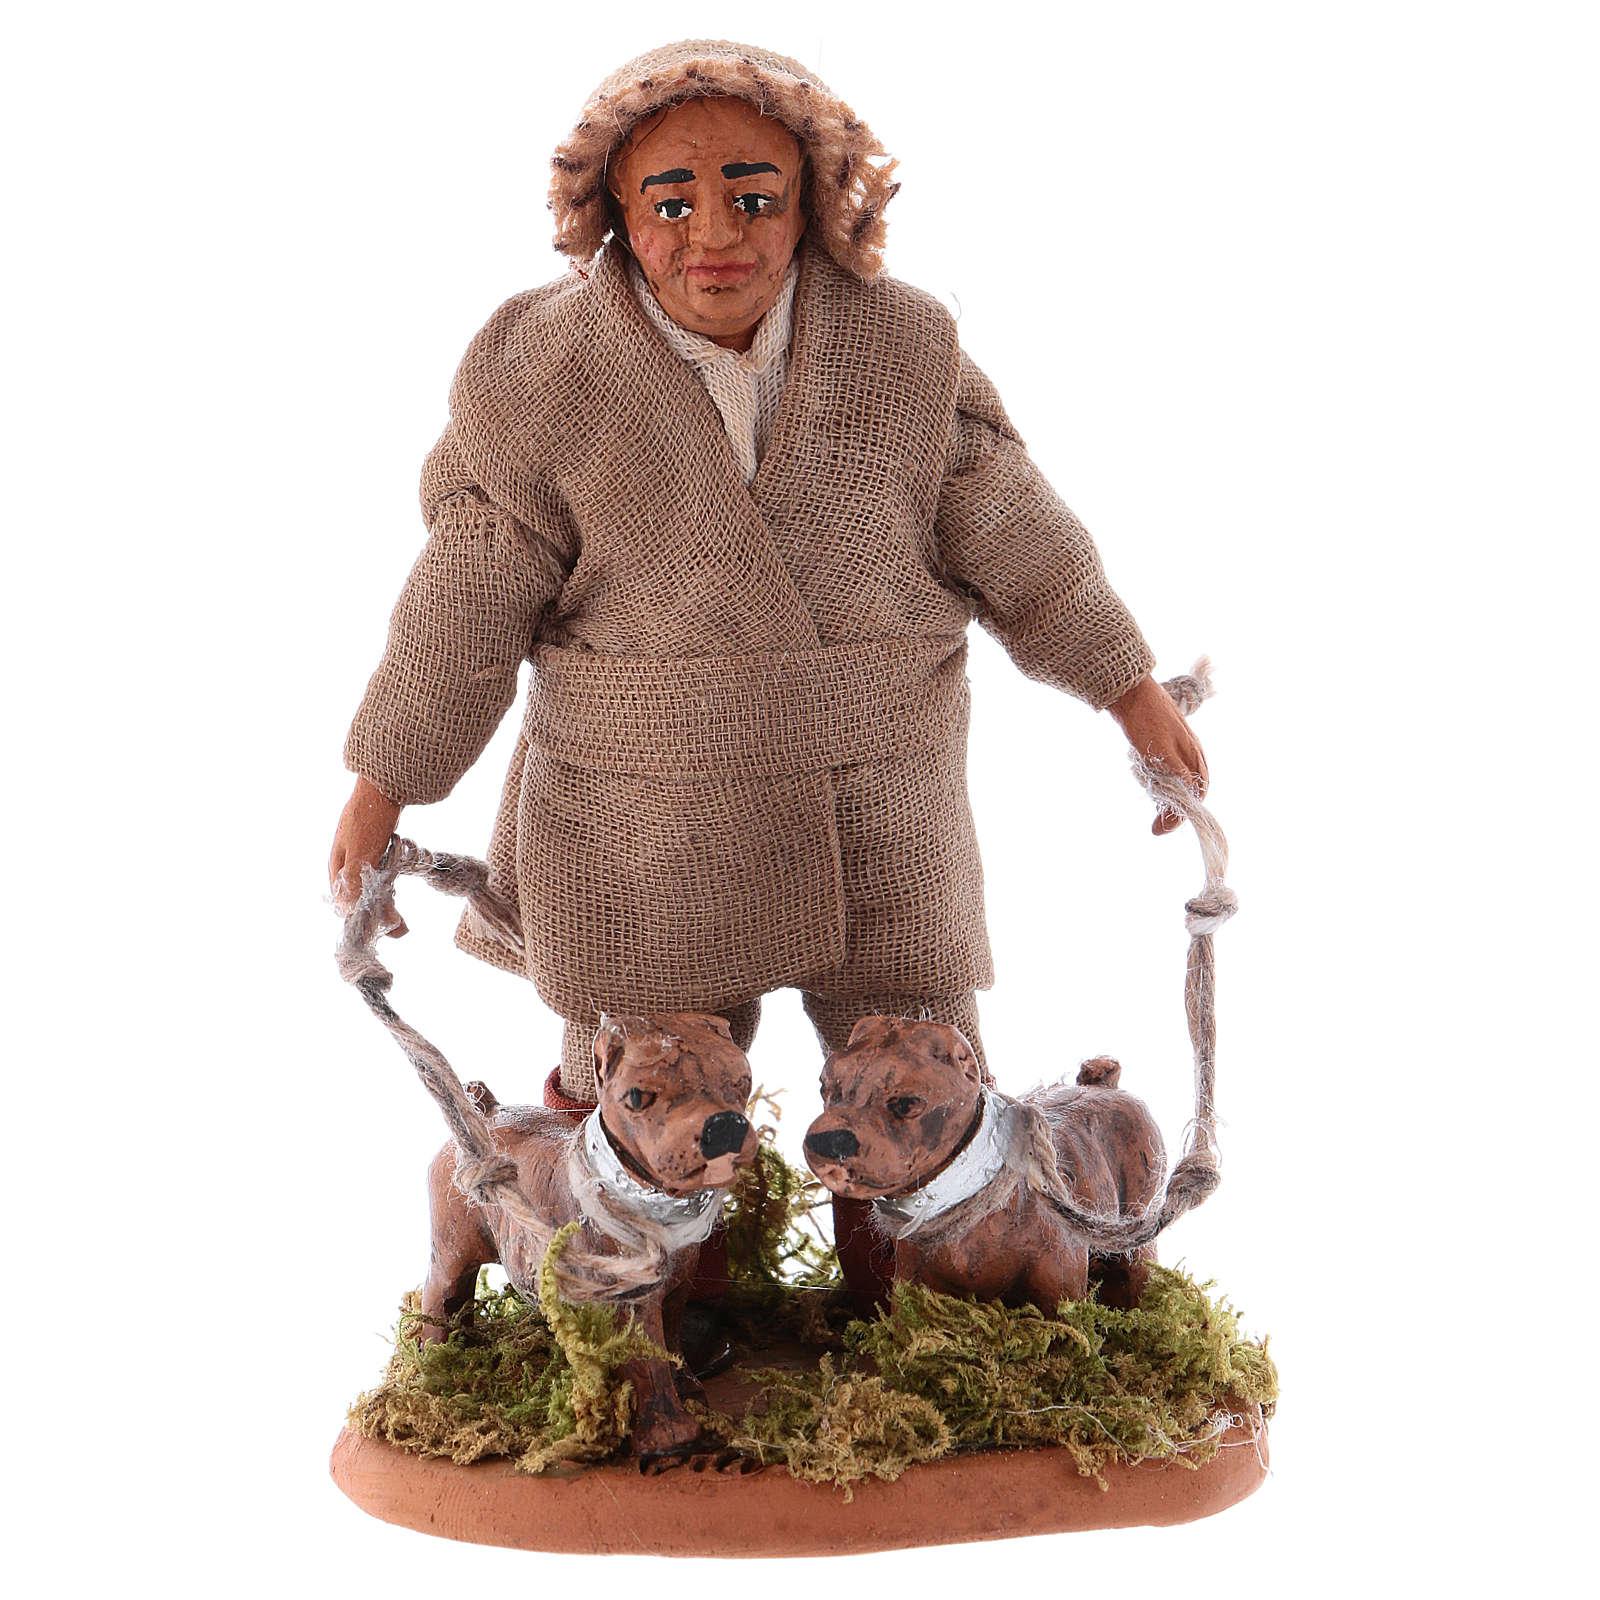 Huner with dogs 10cm, Neapolitan Nativity figurine 4